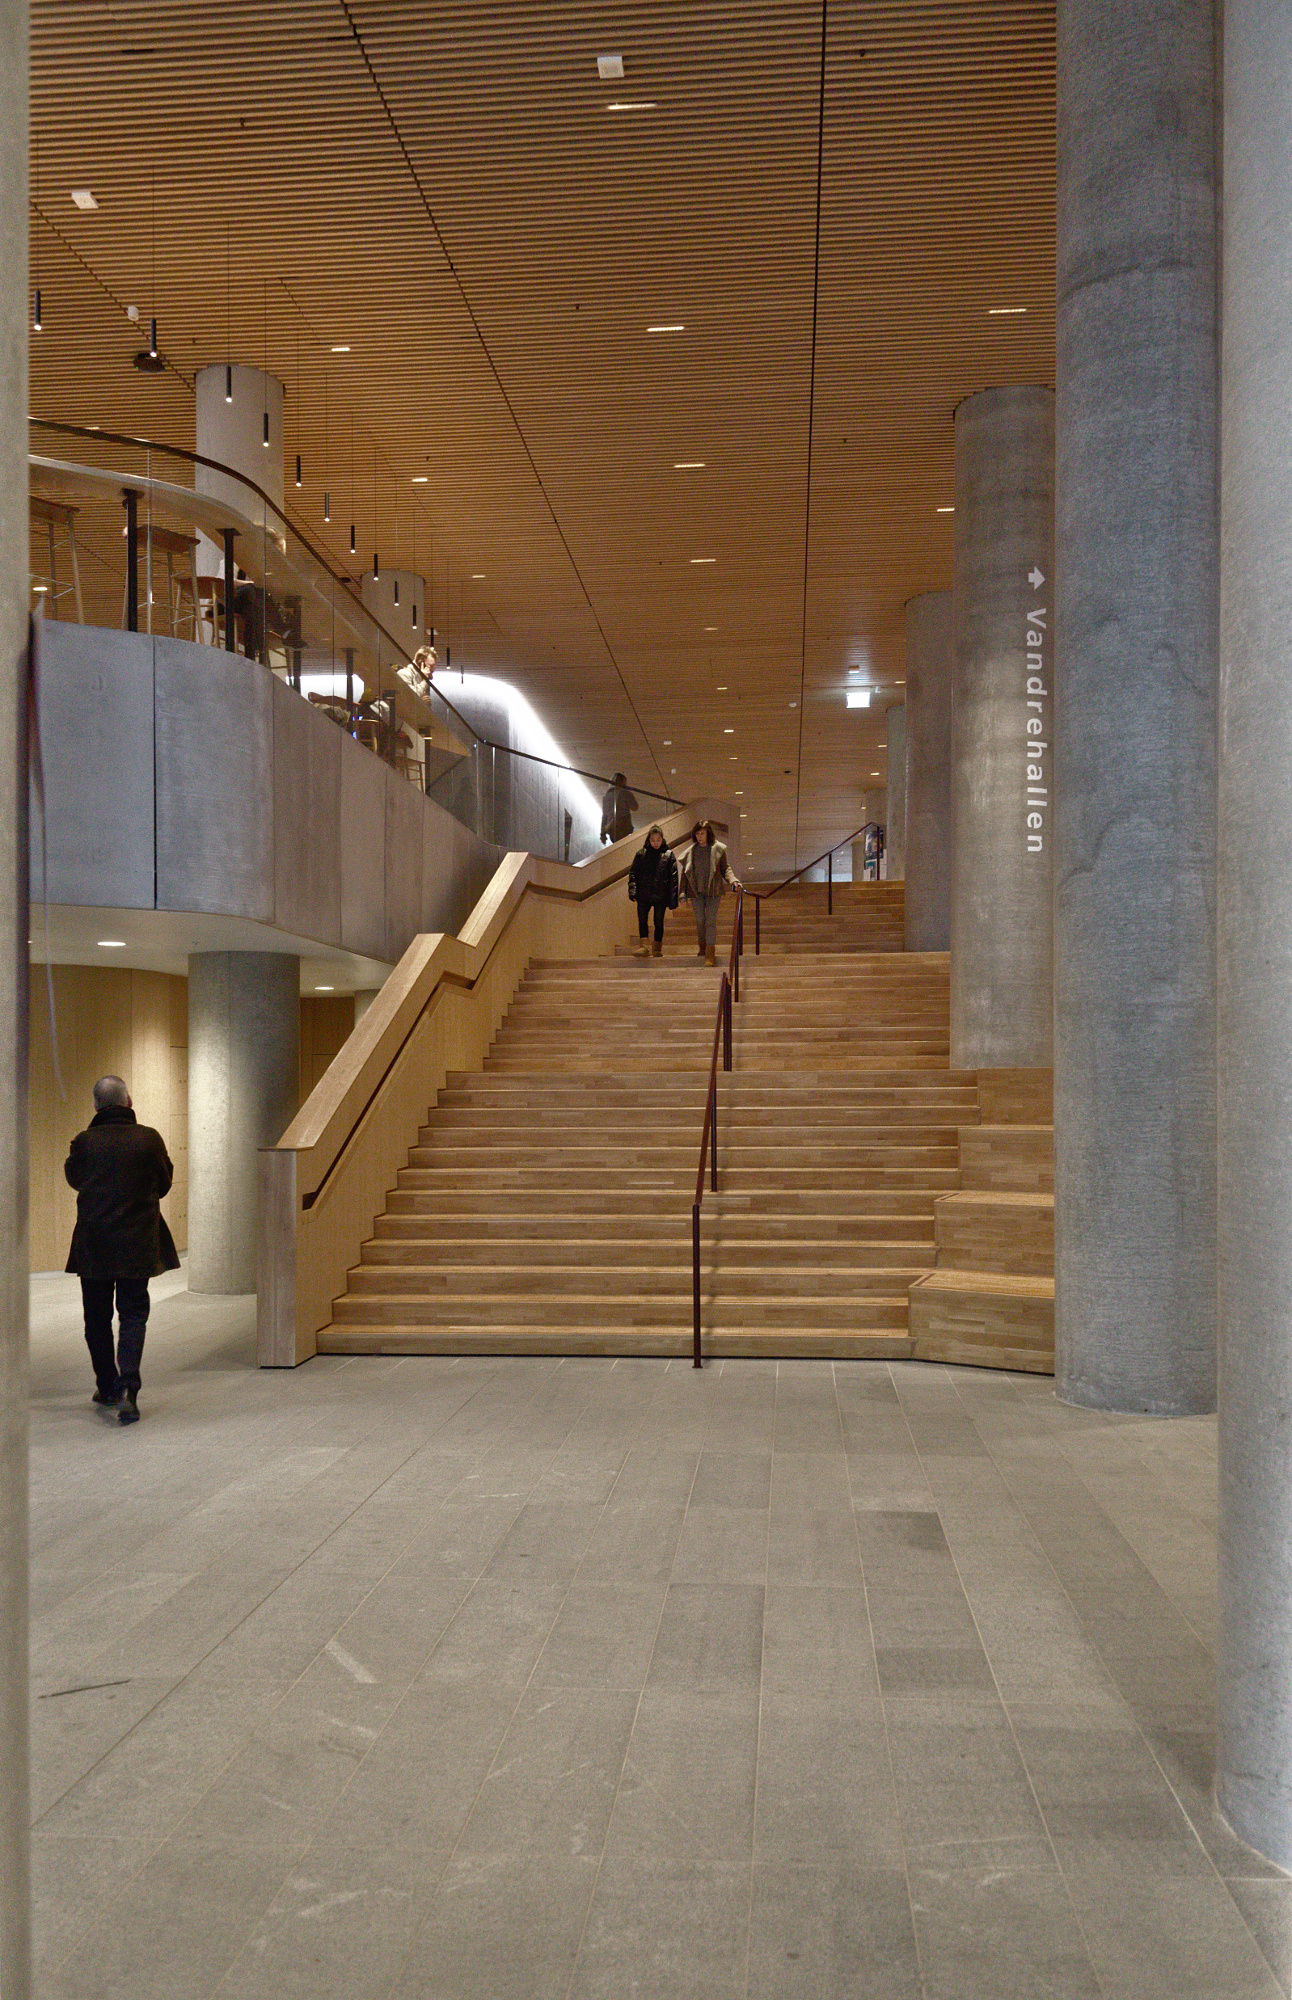 Open Foyer Copenhagen : Maersk tower by c f møller architects ⋆ copenhagen